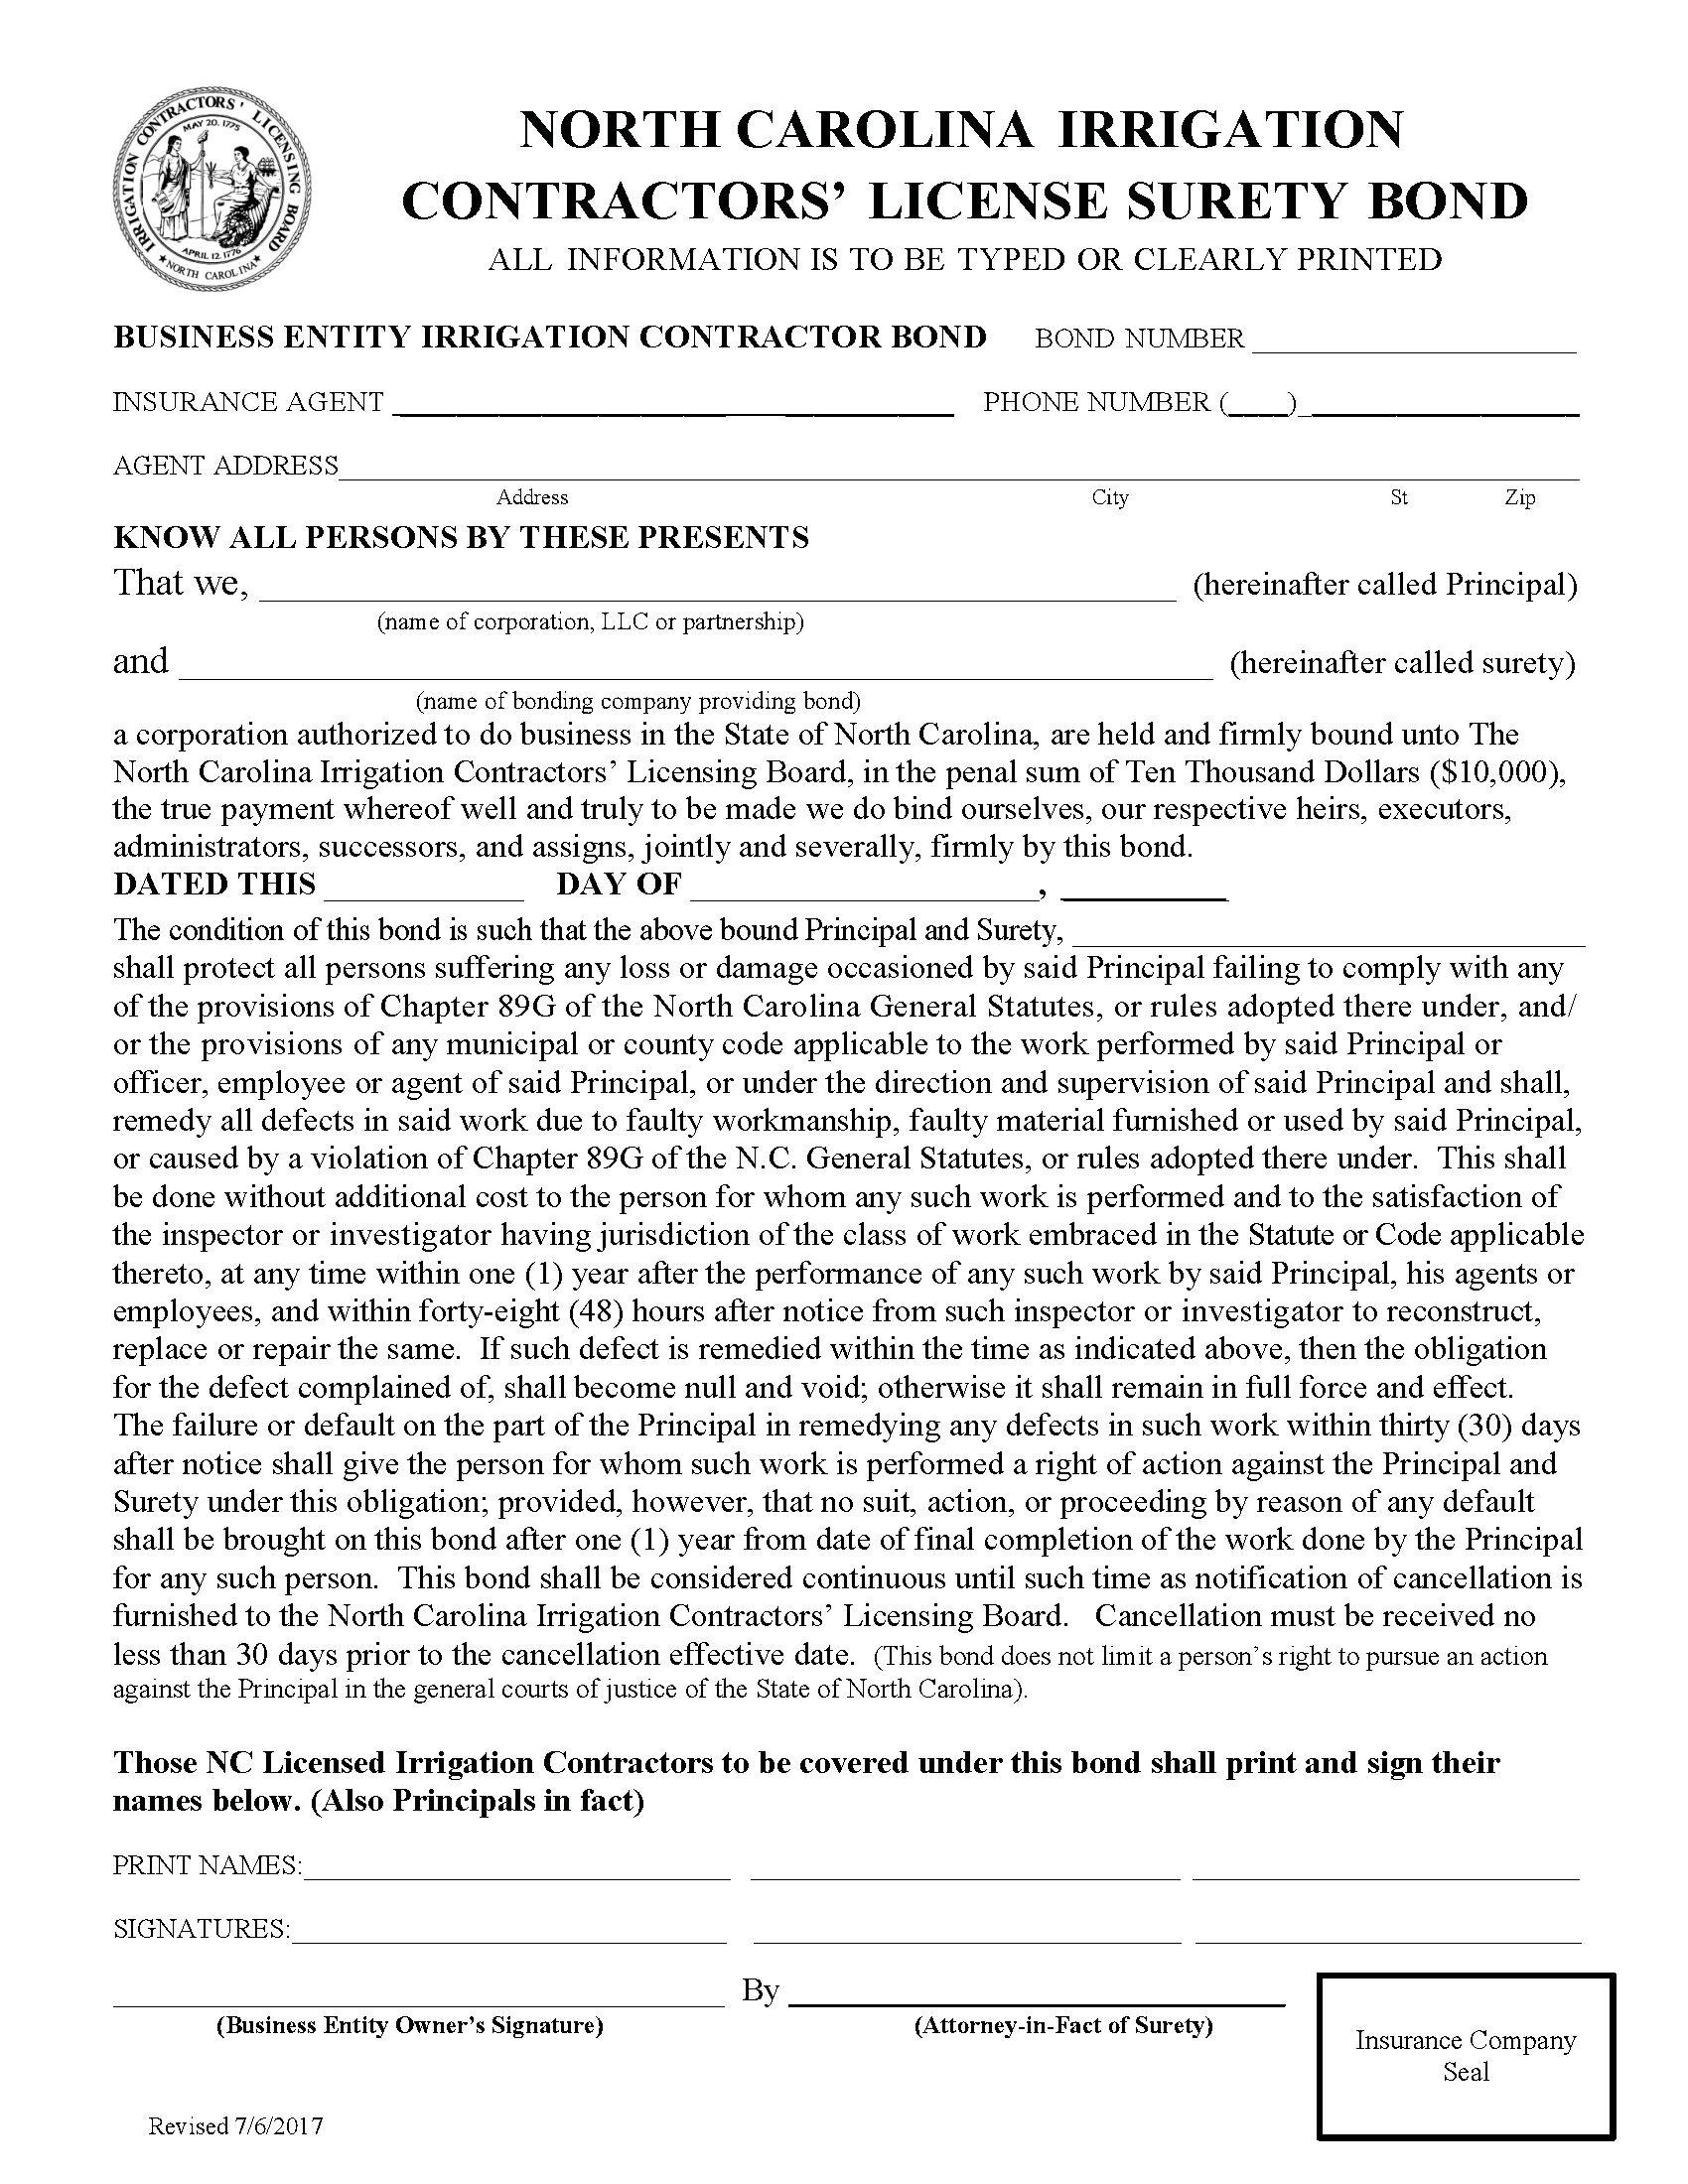 North Carolina Irrigation Contractors Licensing Board Irrigation Contractor (Business Entity) / Irrigation Contractor (Individual/Sole Proprietor) sample image